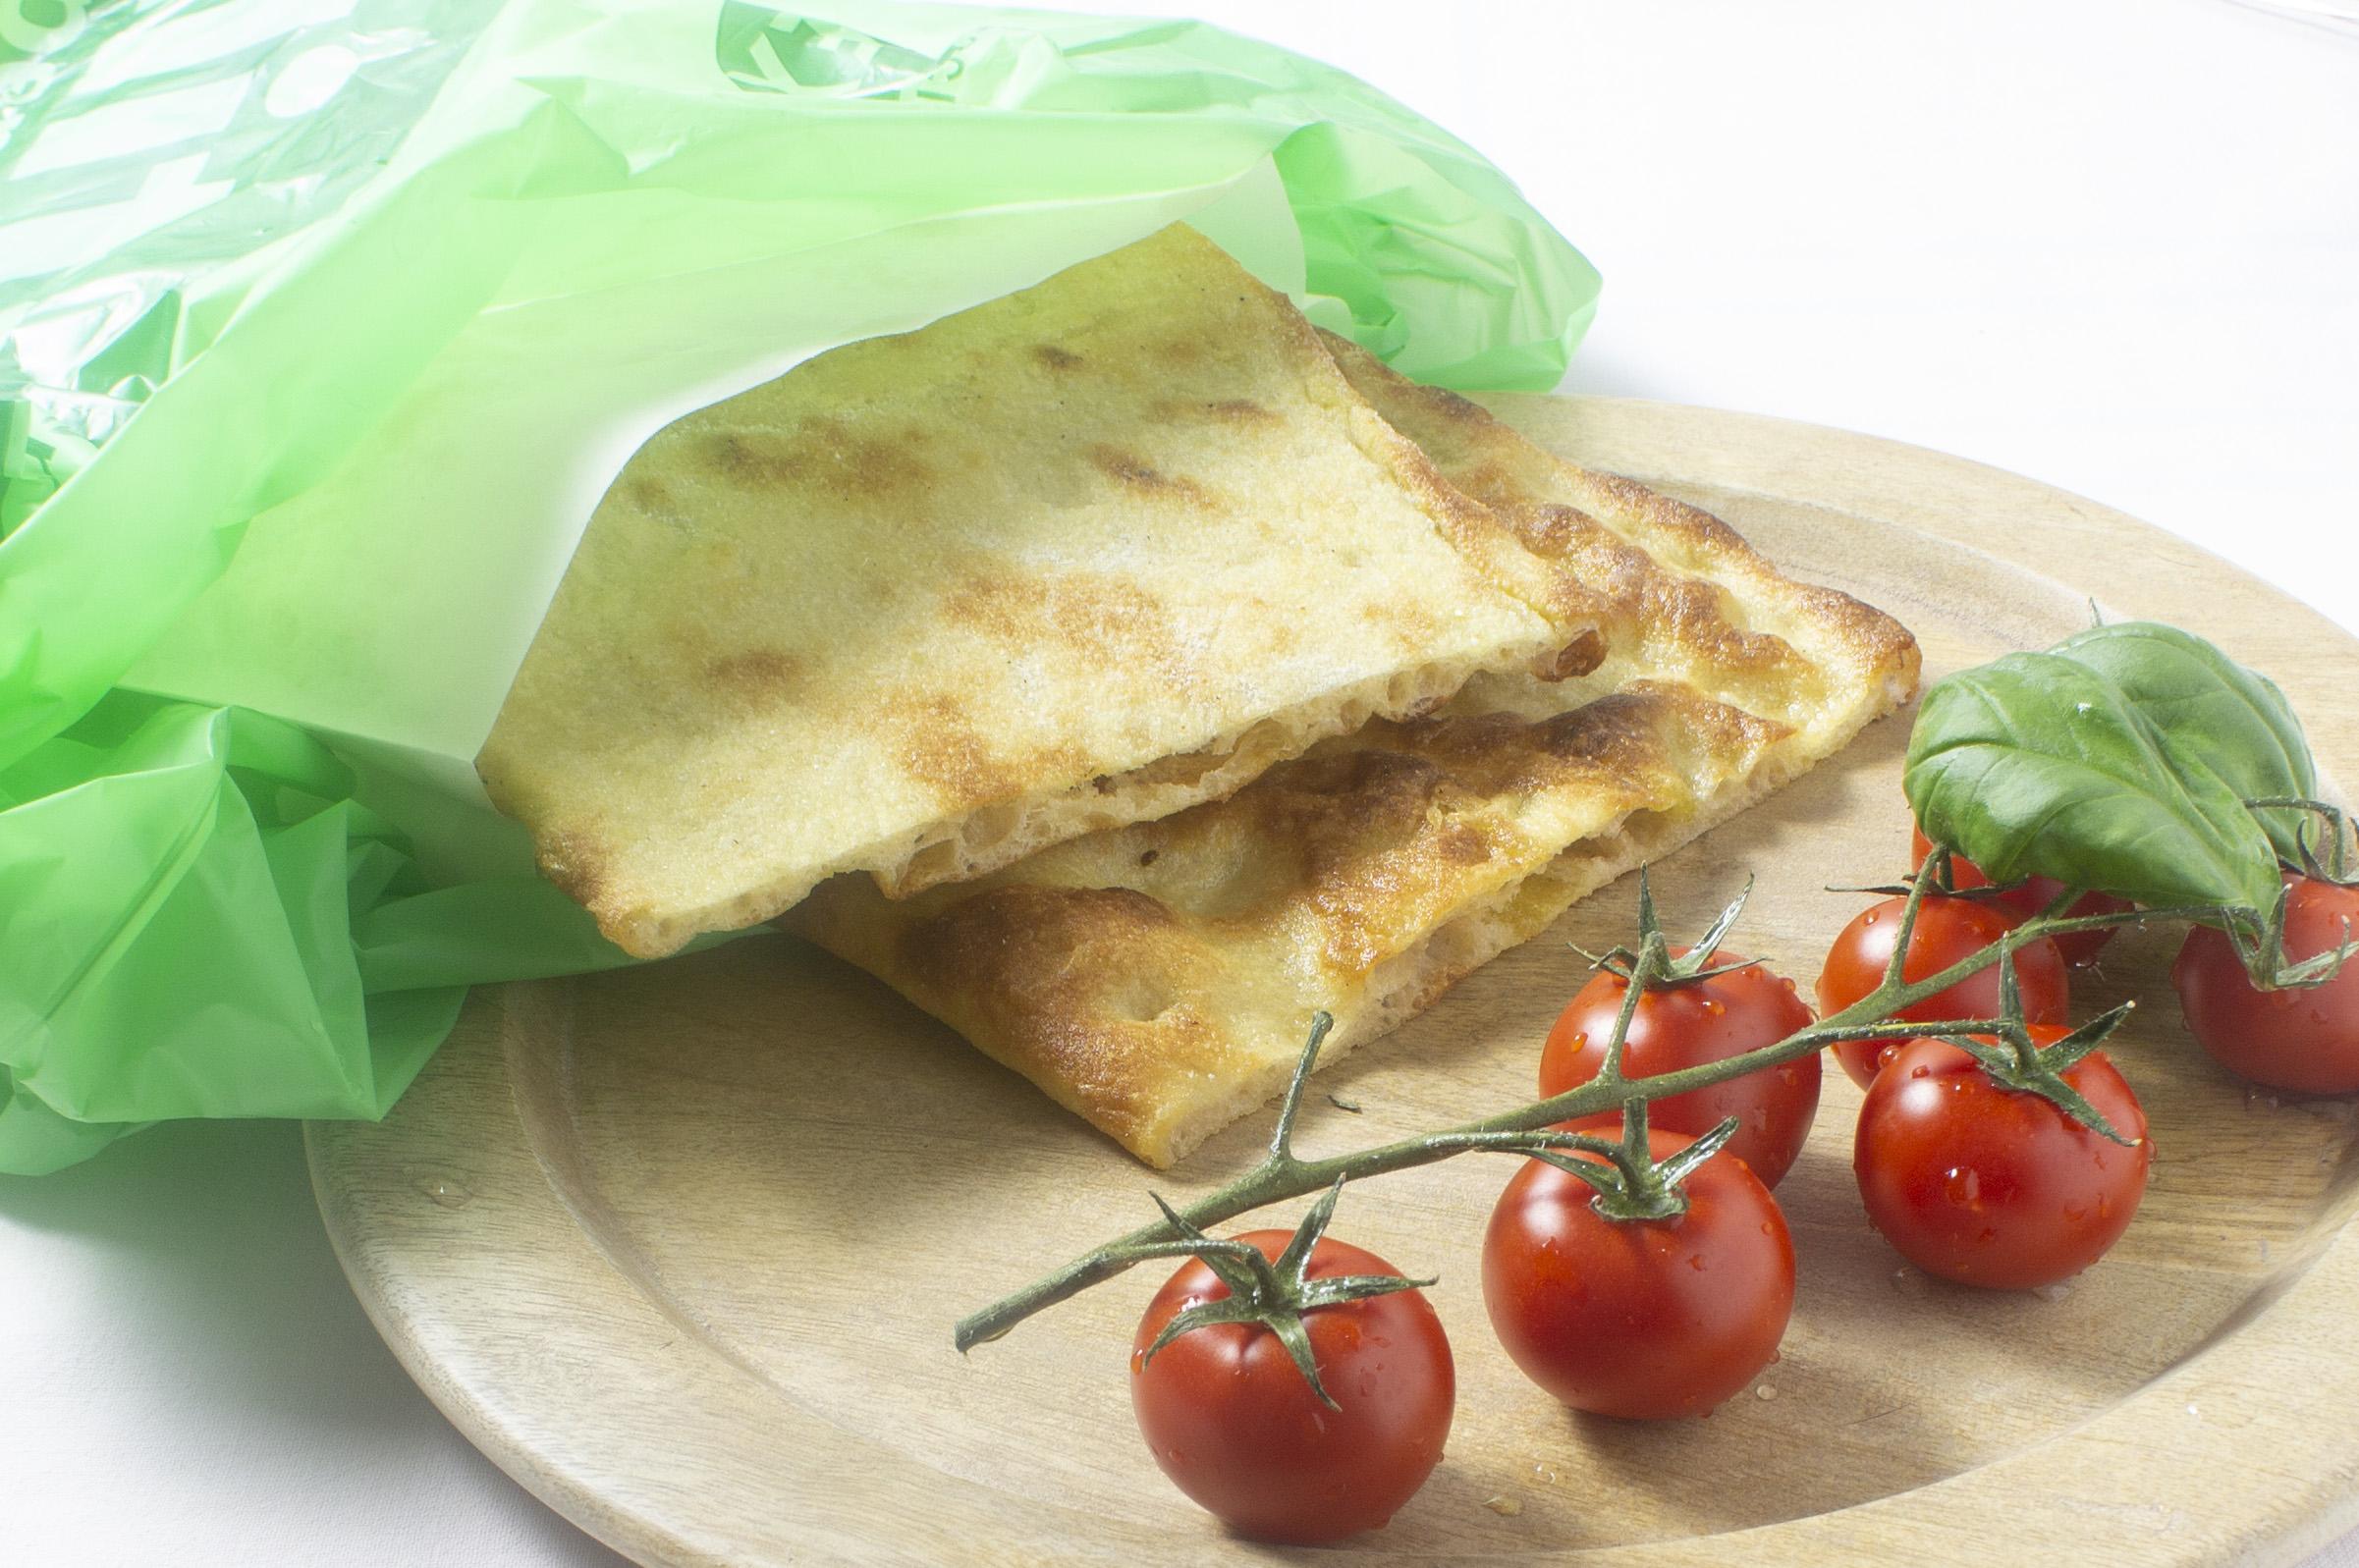 Pinsa con pomodoro e basilico